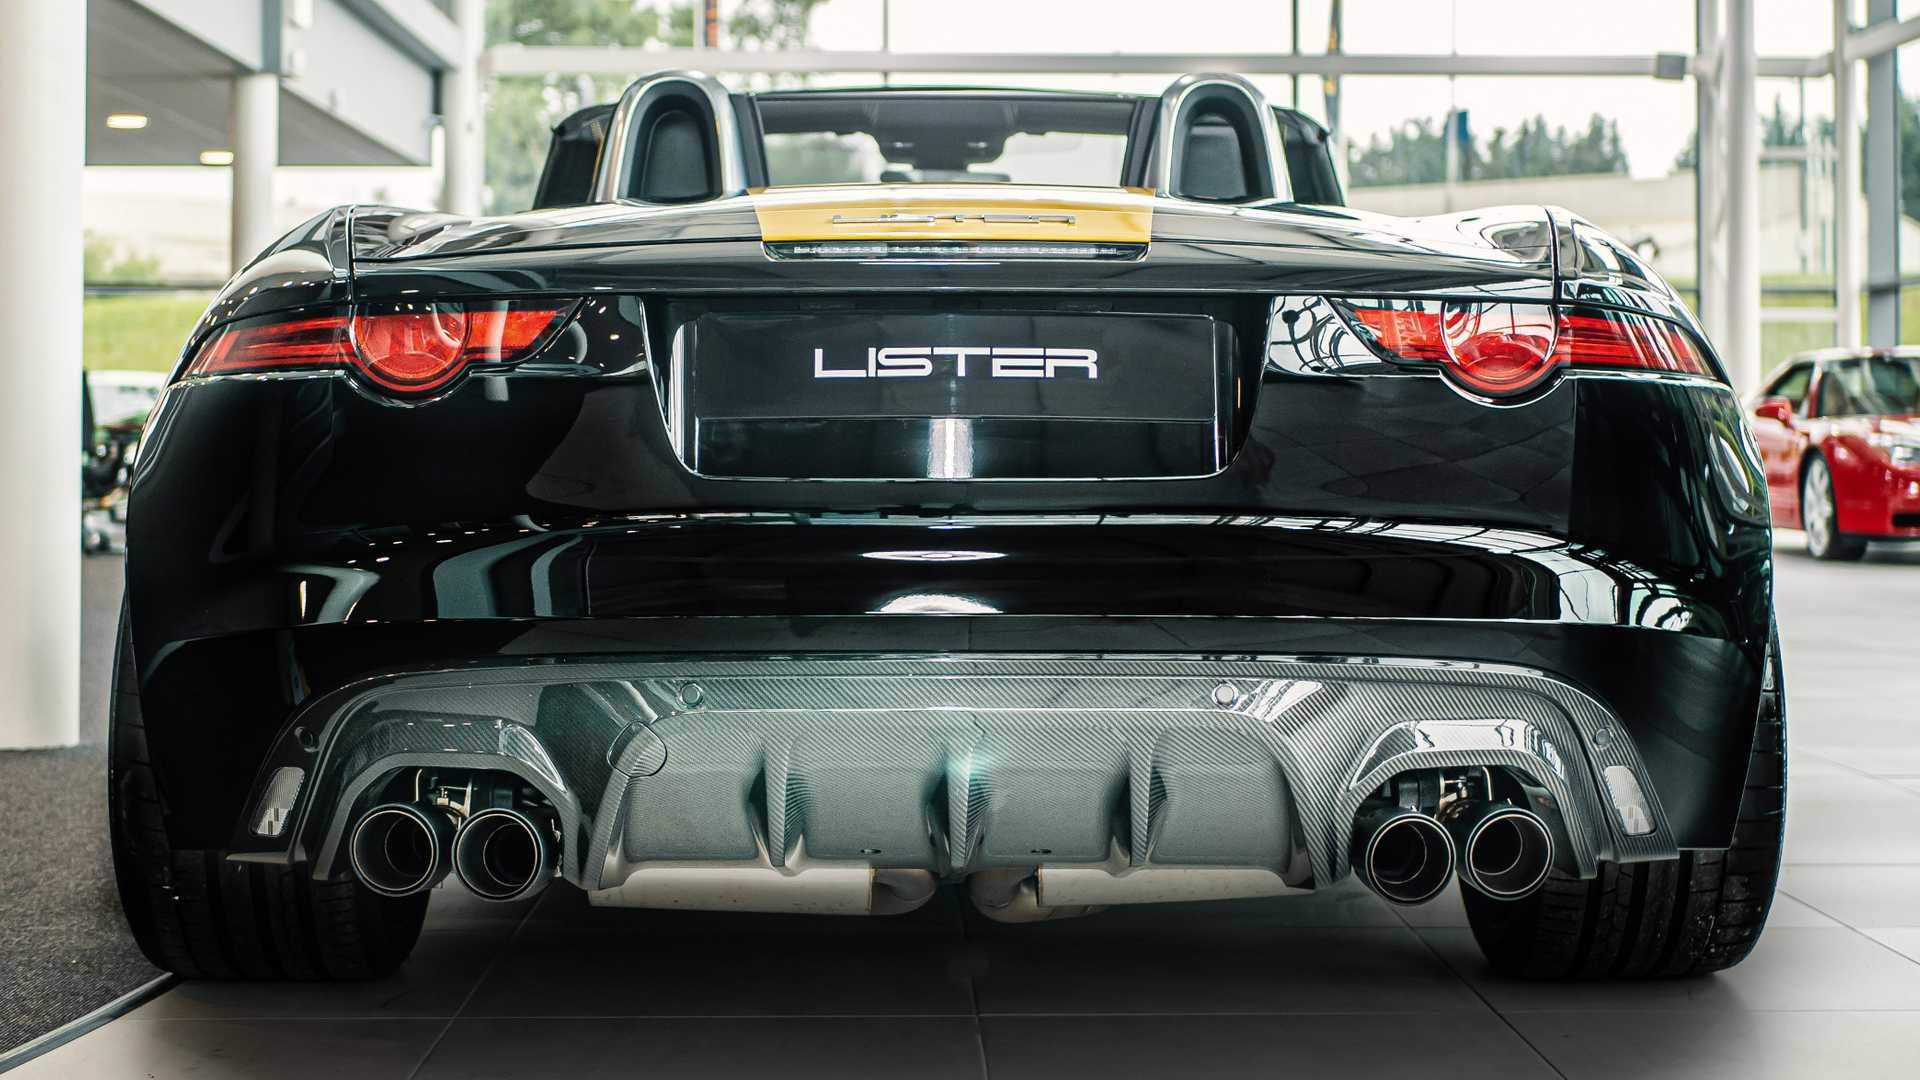 Lister LFT-C